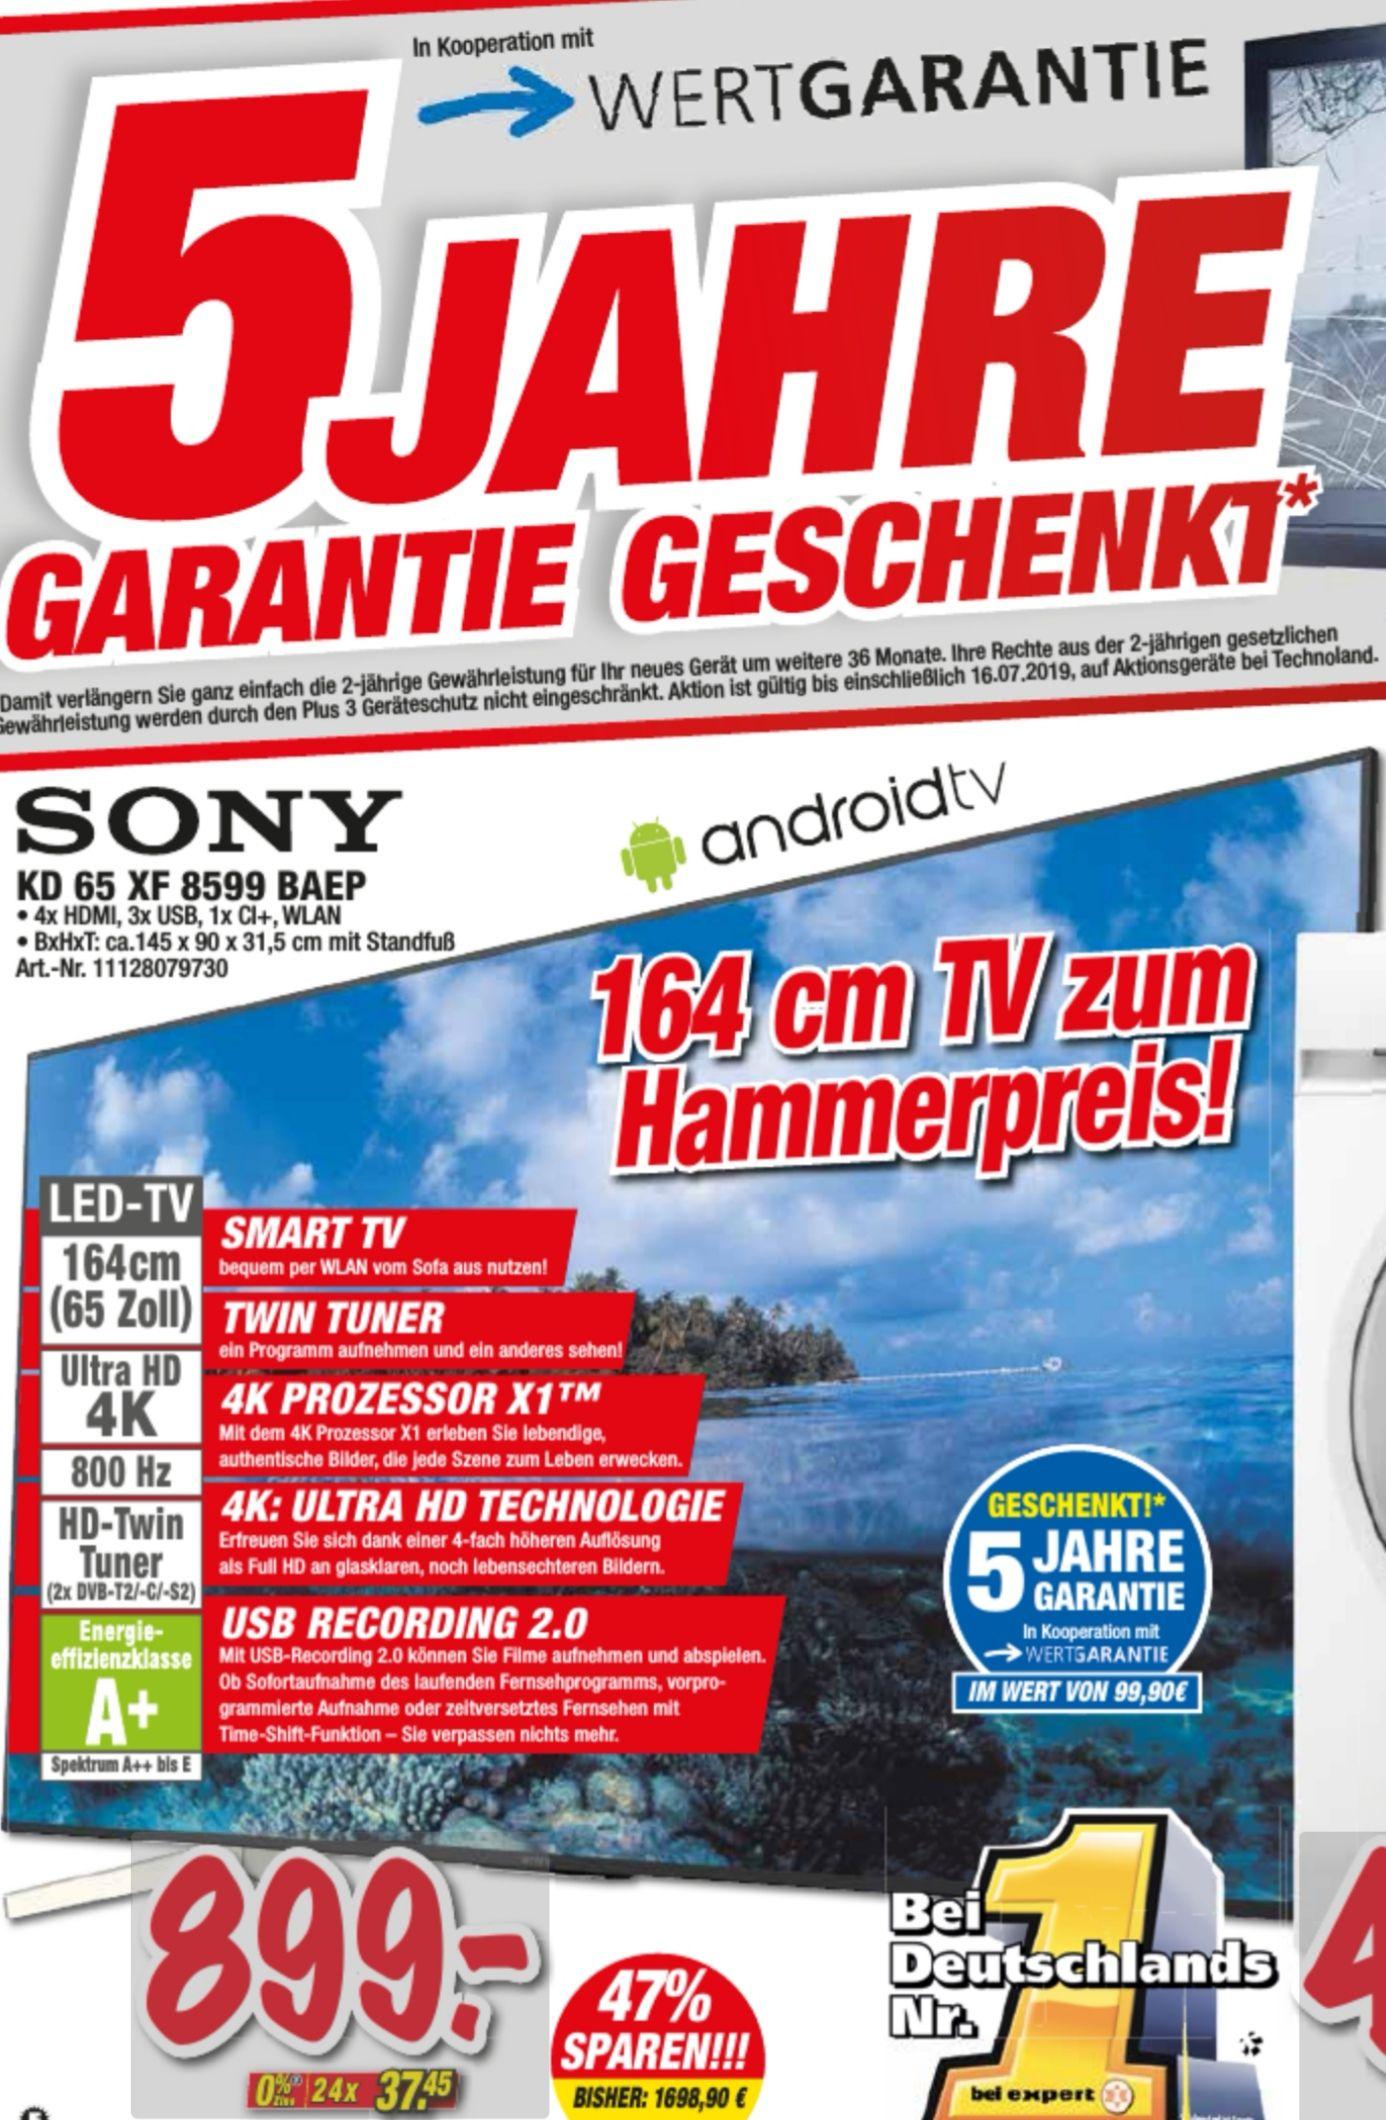 Sony-KD65XF8599BAEP Android-TV 164cm 65 Zoll LED 4K UHD 800Hz A+ DVB-T2/C/S2 (Schwarz)